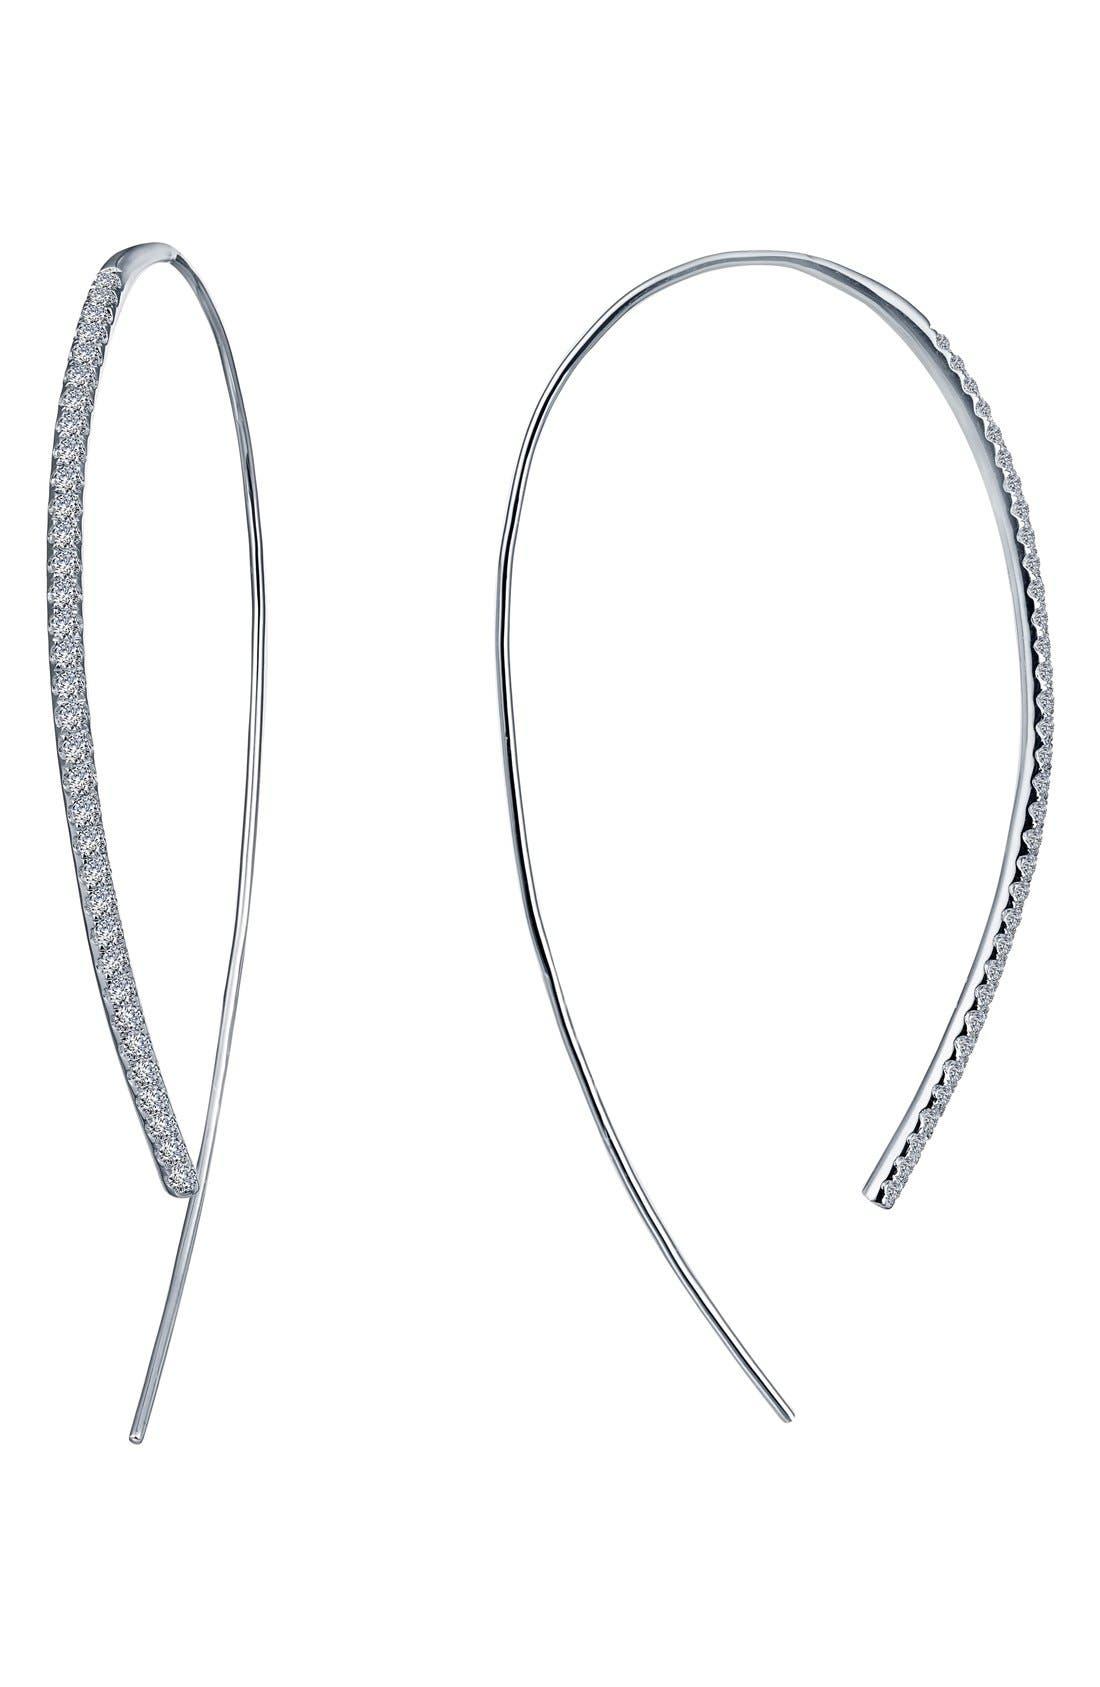 Open Hoop Threader Earrings,                             Main thumbnail 1, color,                             Silver